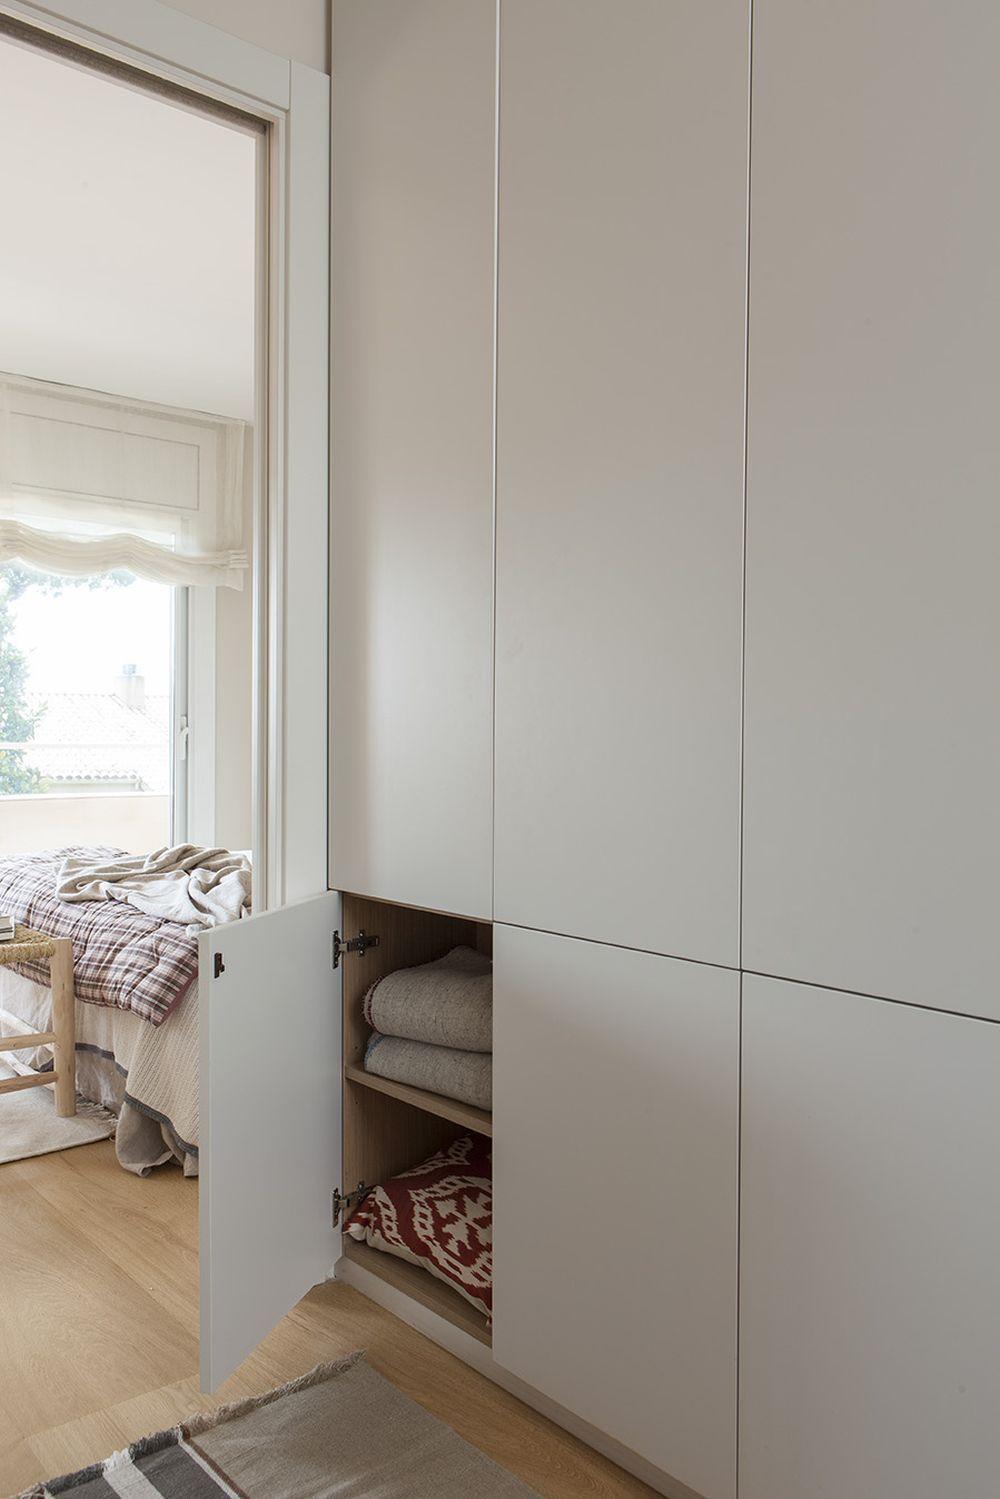 adelaparvu.com despre casa cu gradina, accente marine, designer Jeanette Dresing, Foto Feran Freixa (18)